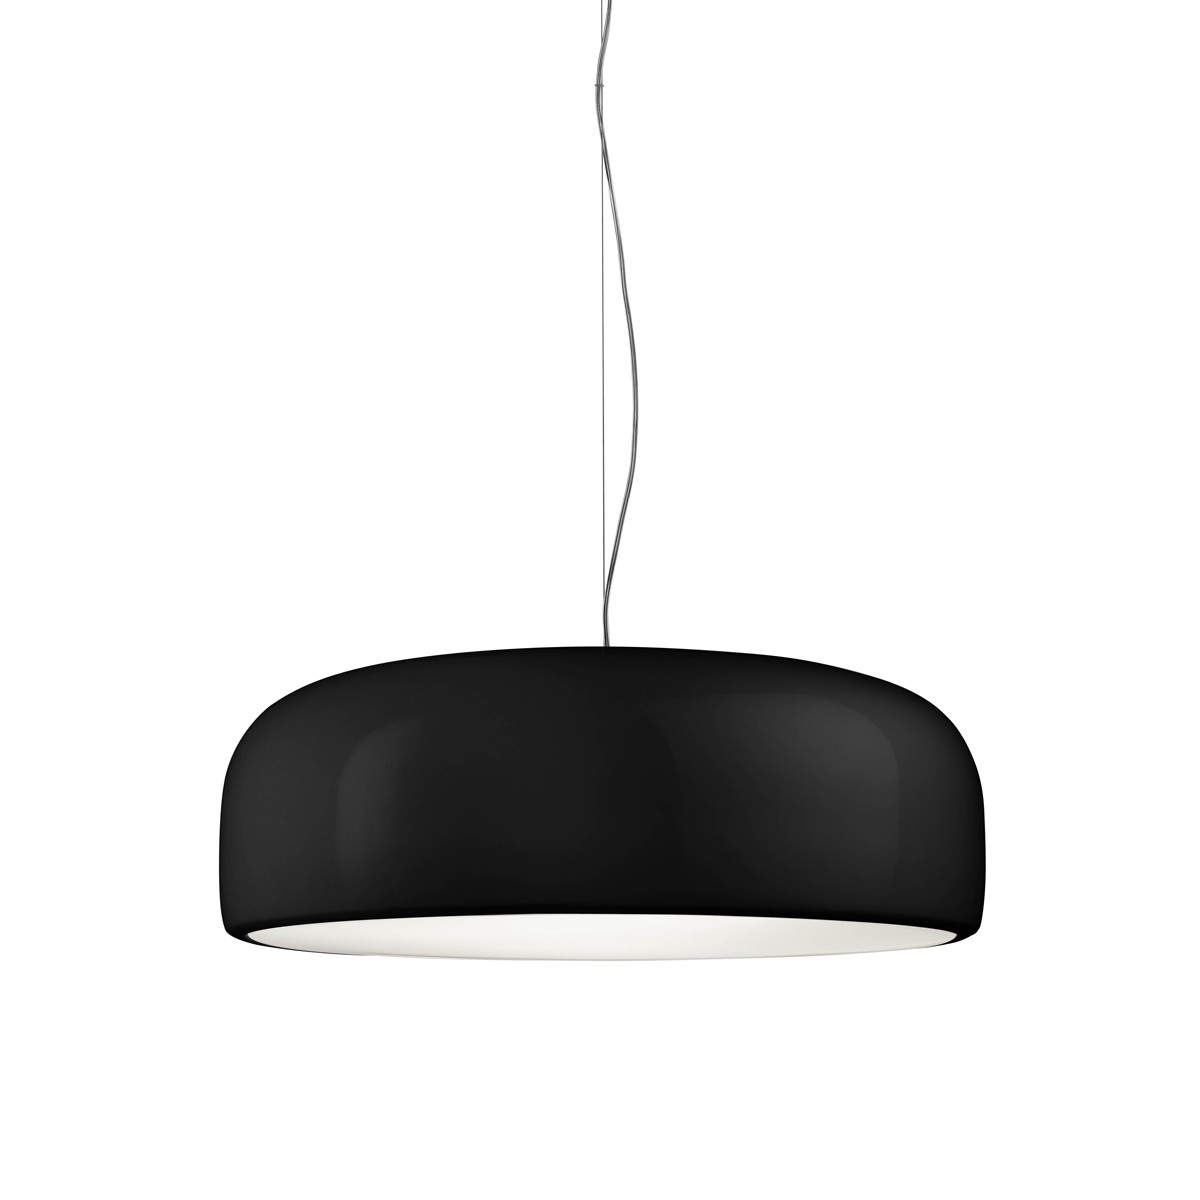 Flos Smithfield S LED Pendelleuchte, schwarz